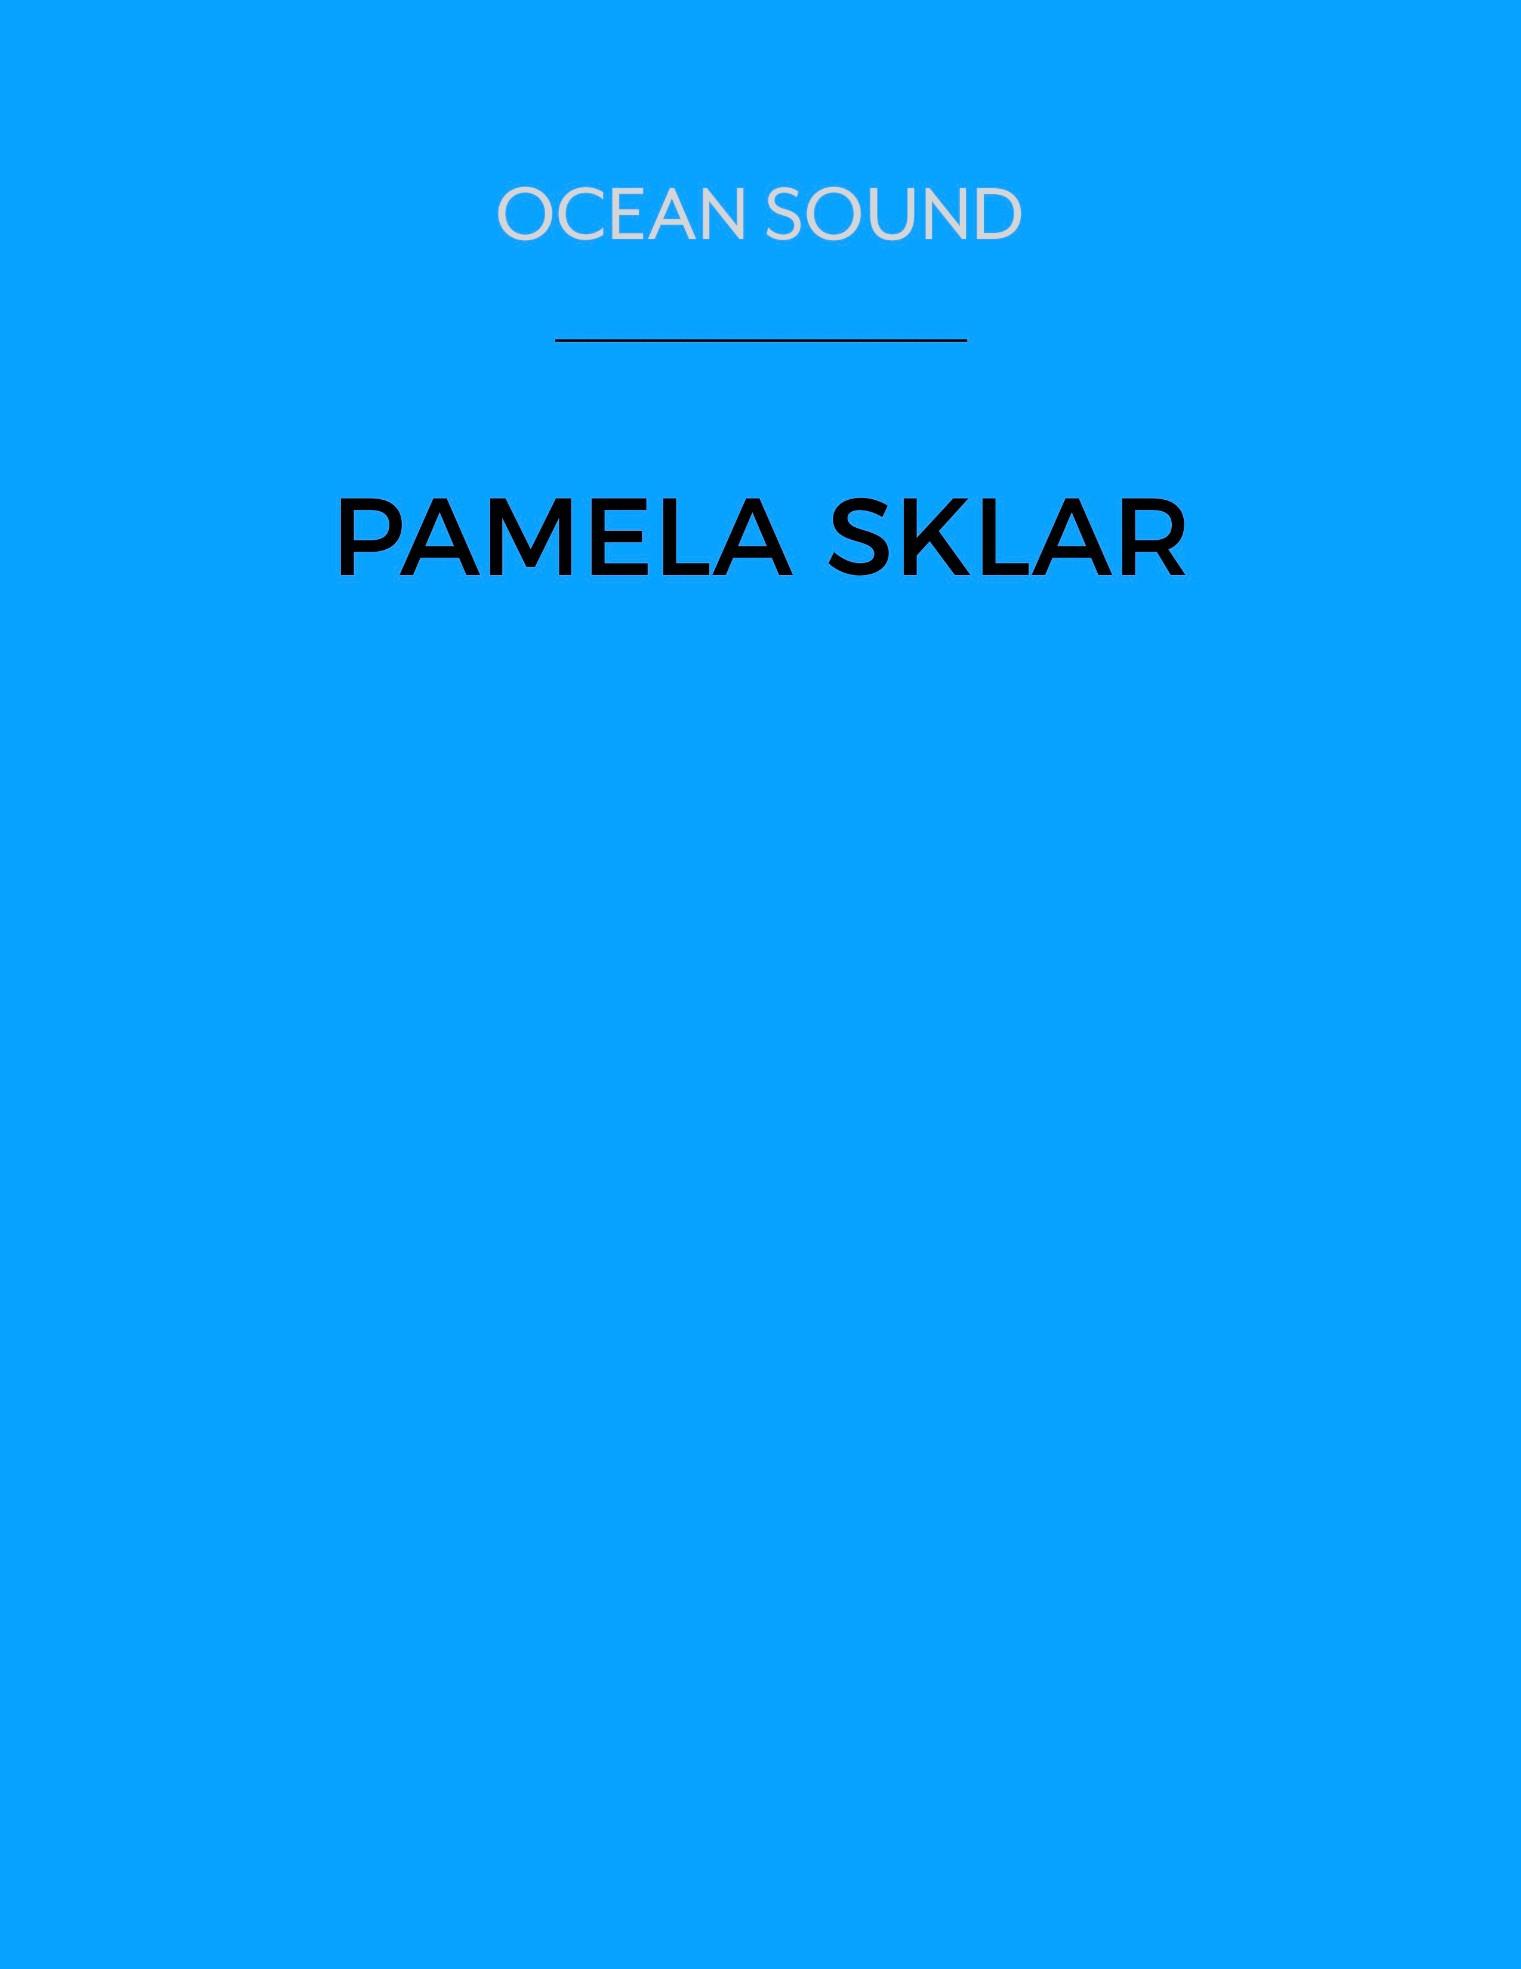 Ocean Sound | Pamela Sklar, flutist